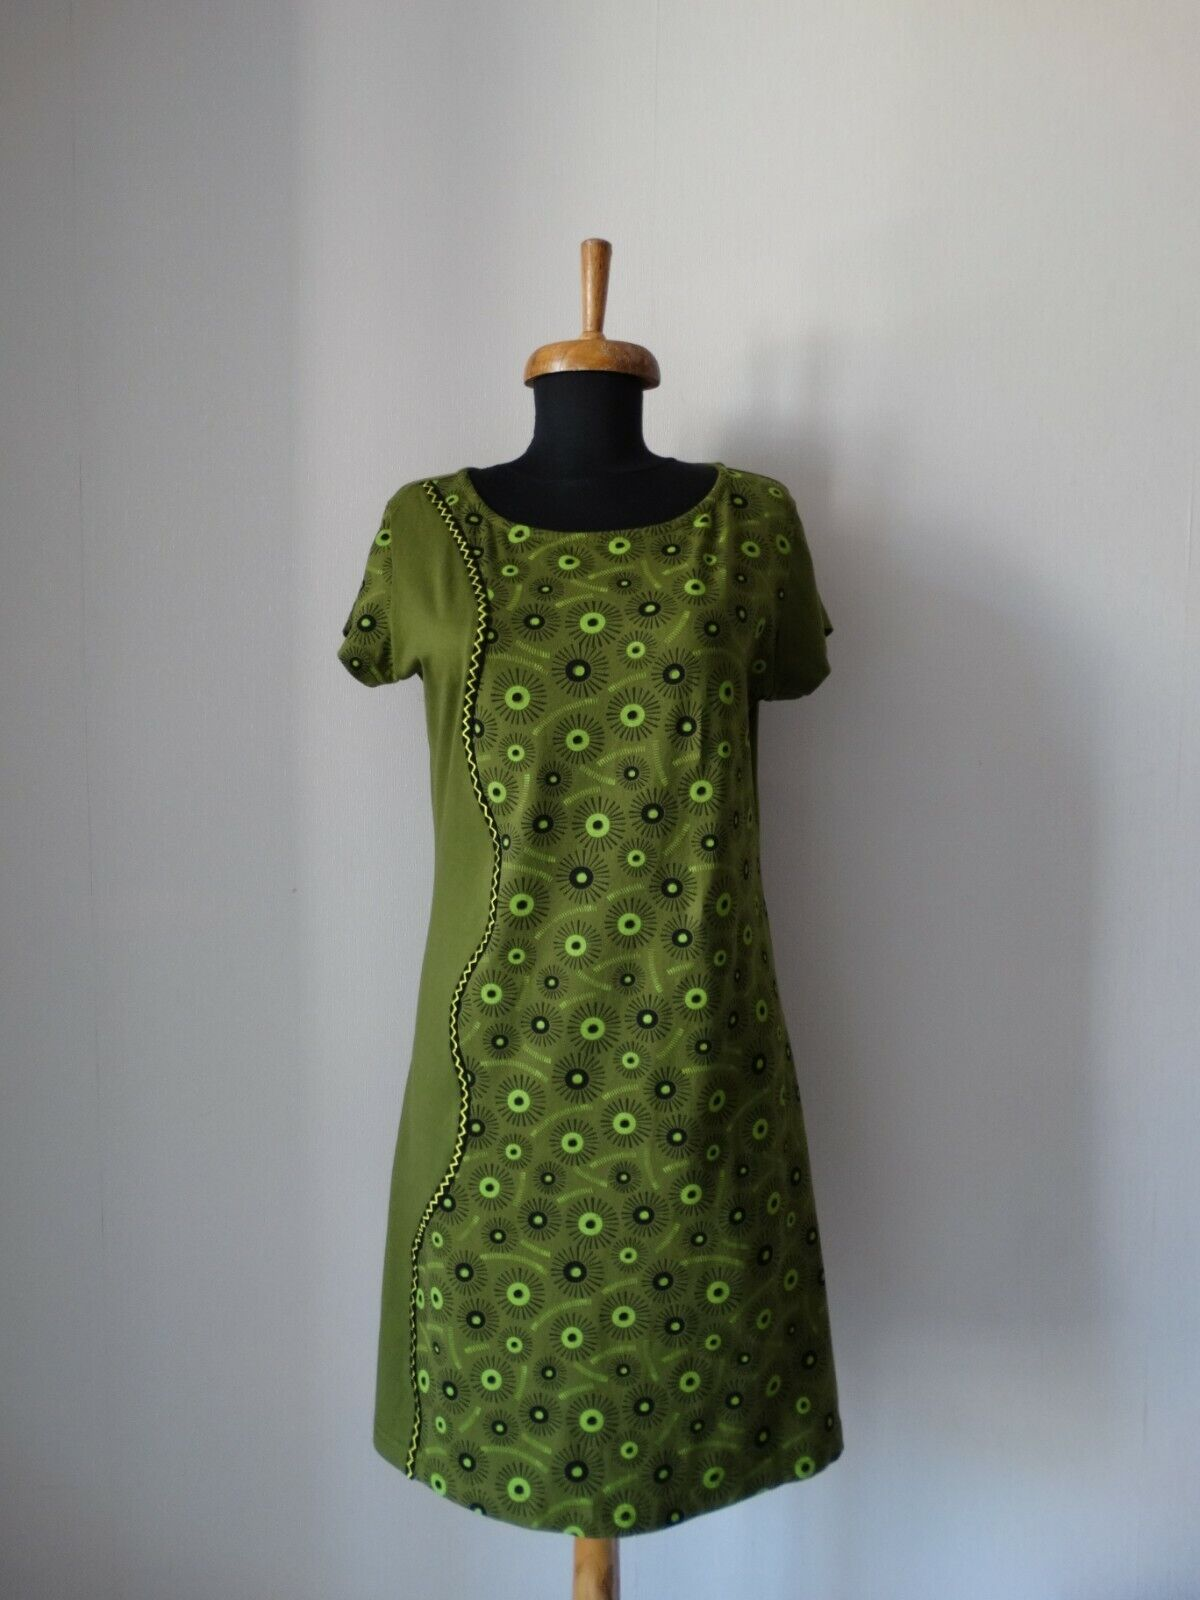 Deerberg Baumwolle Soomer Kleid Cotton Dress size S